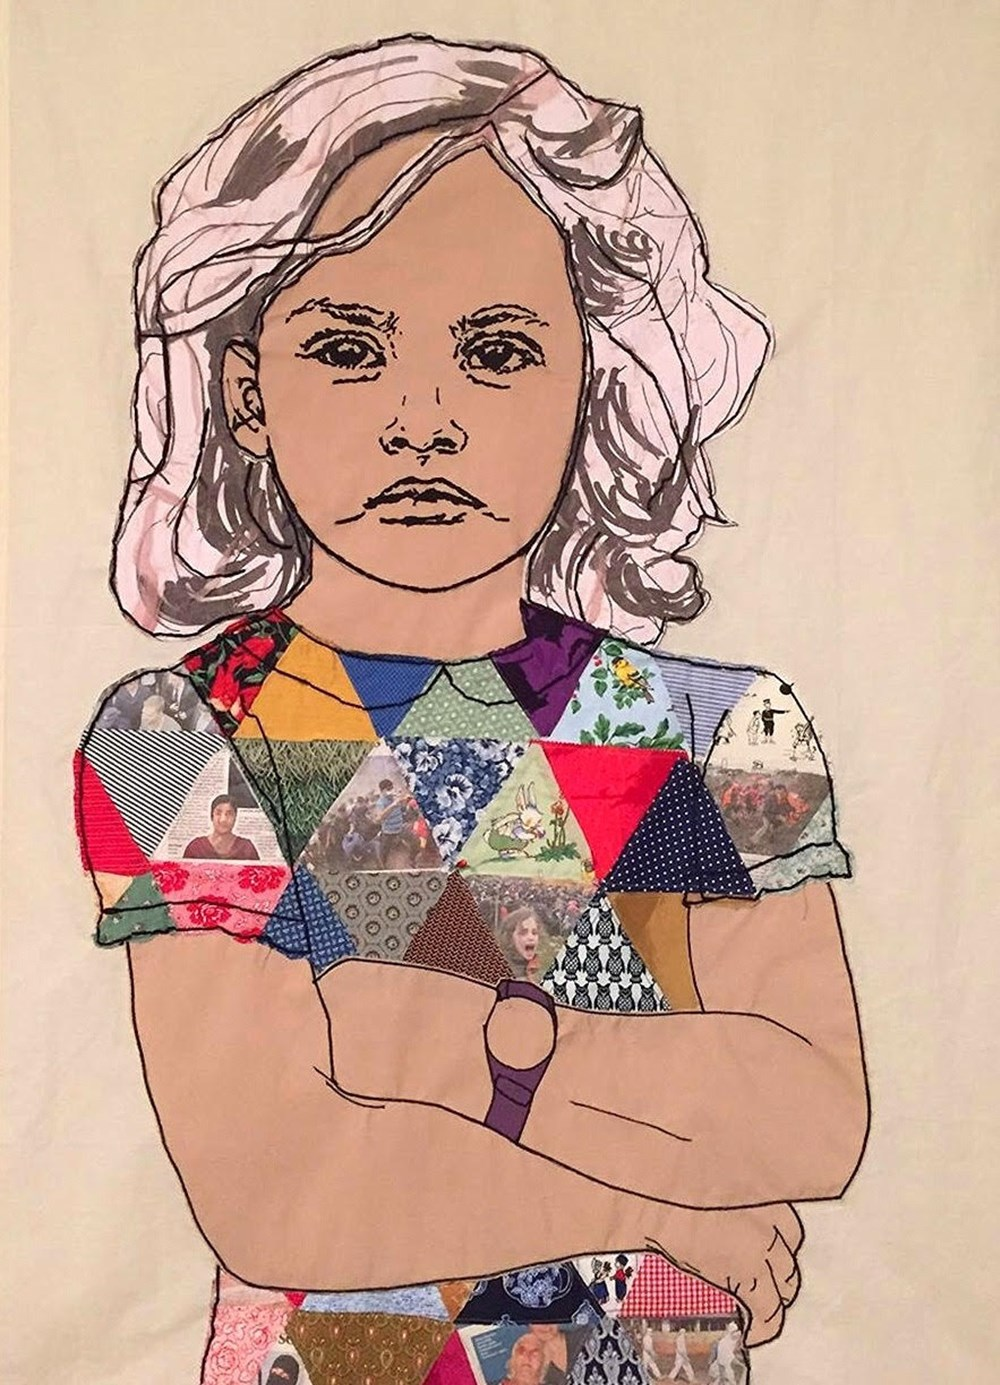 Paper   |   Scissors   |   Stone - Lot 23, Tisna Westerhof, Costume Drama I